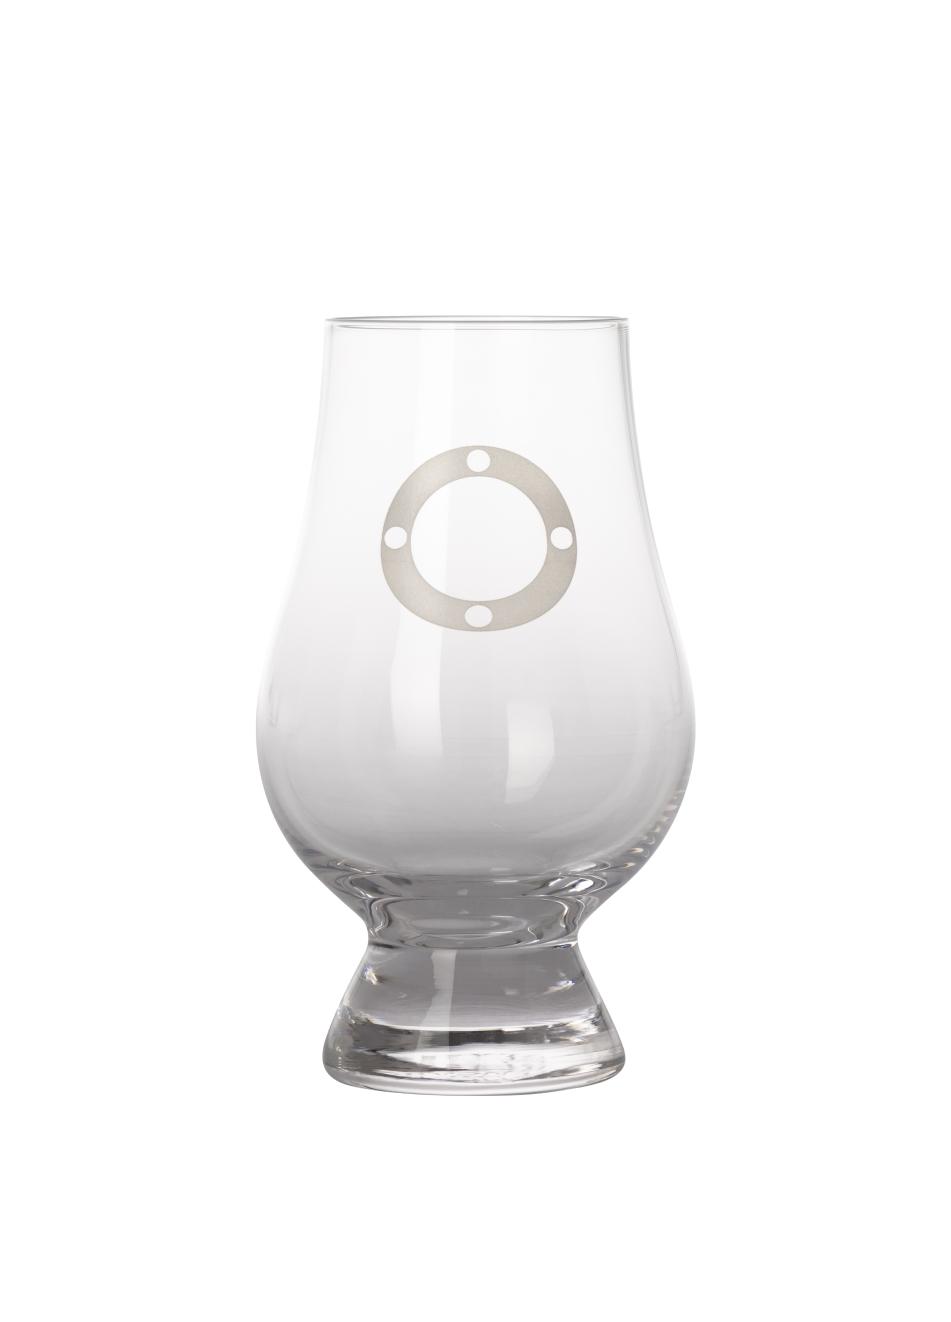 Cardrona Glencairn glass - duo pack